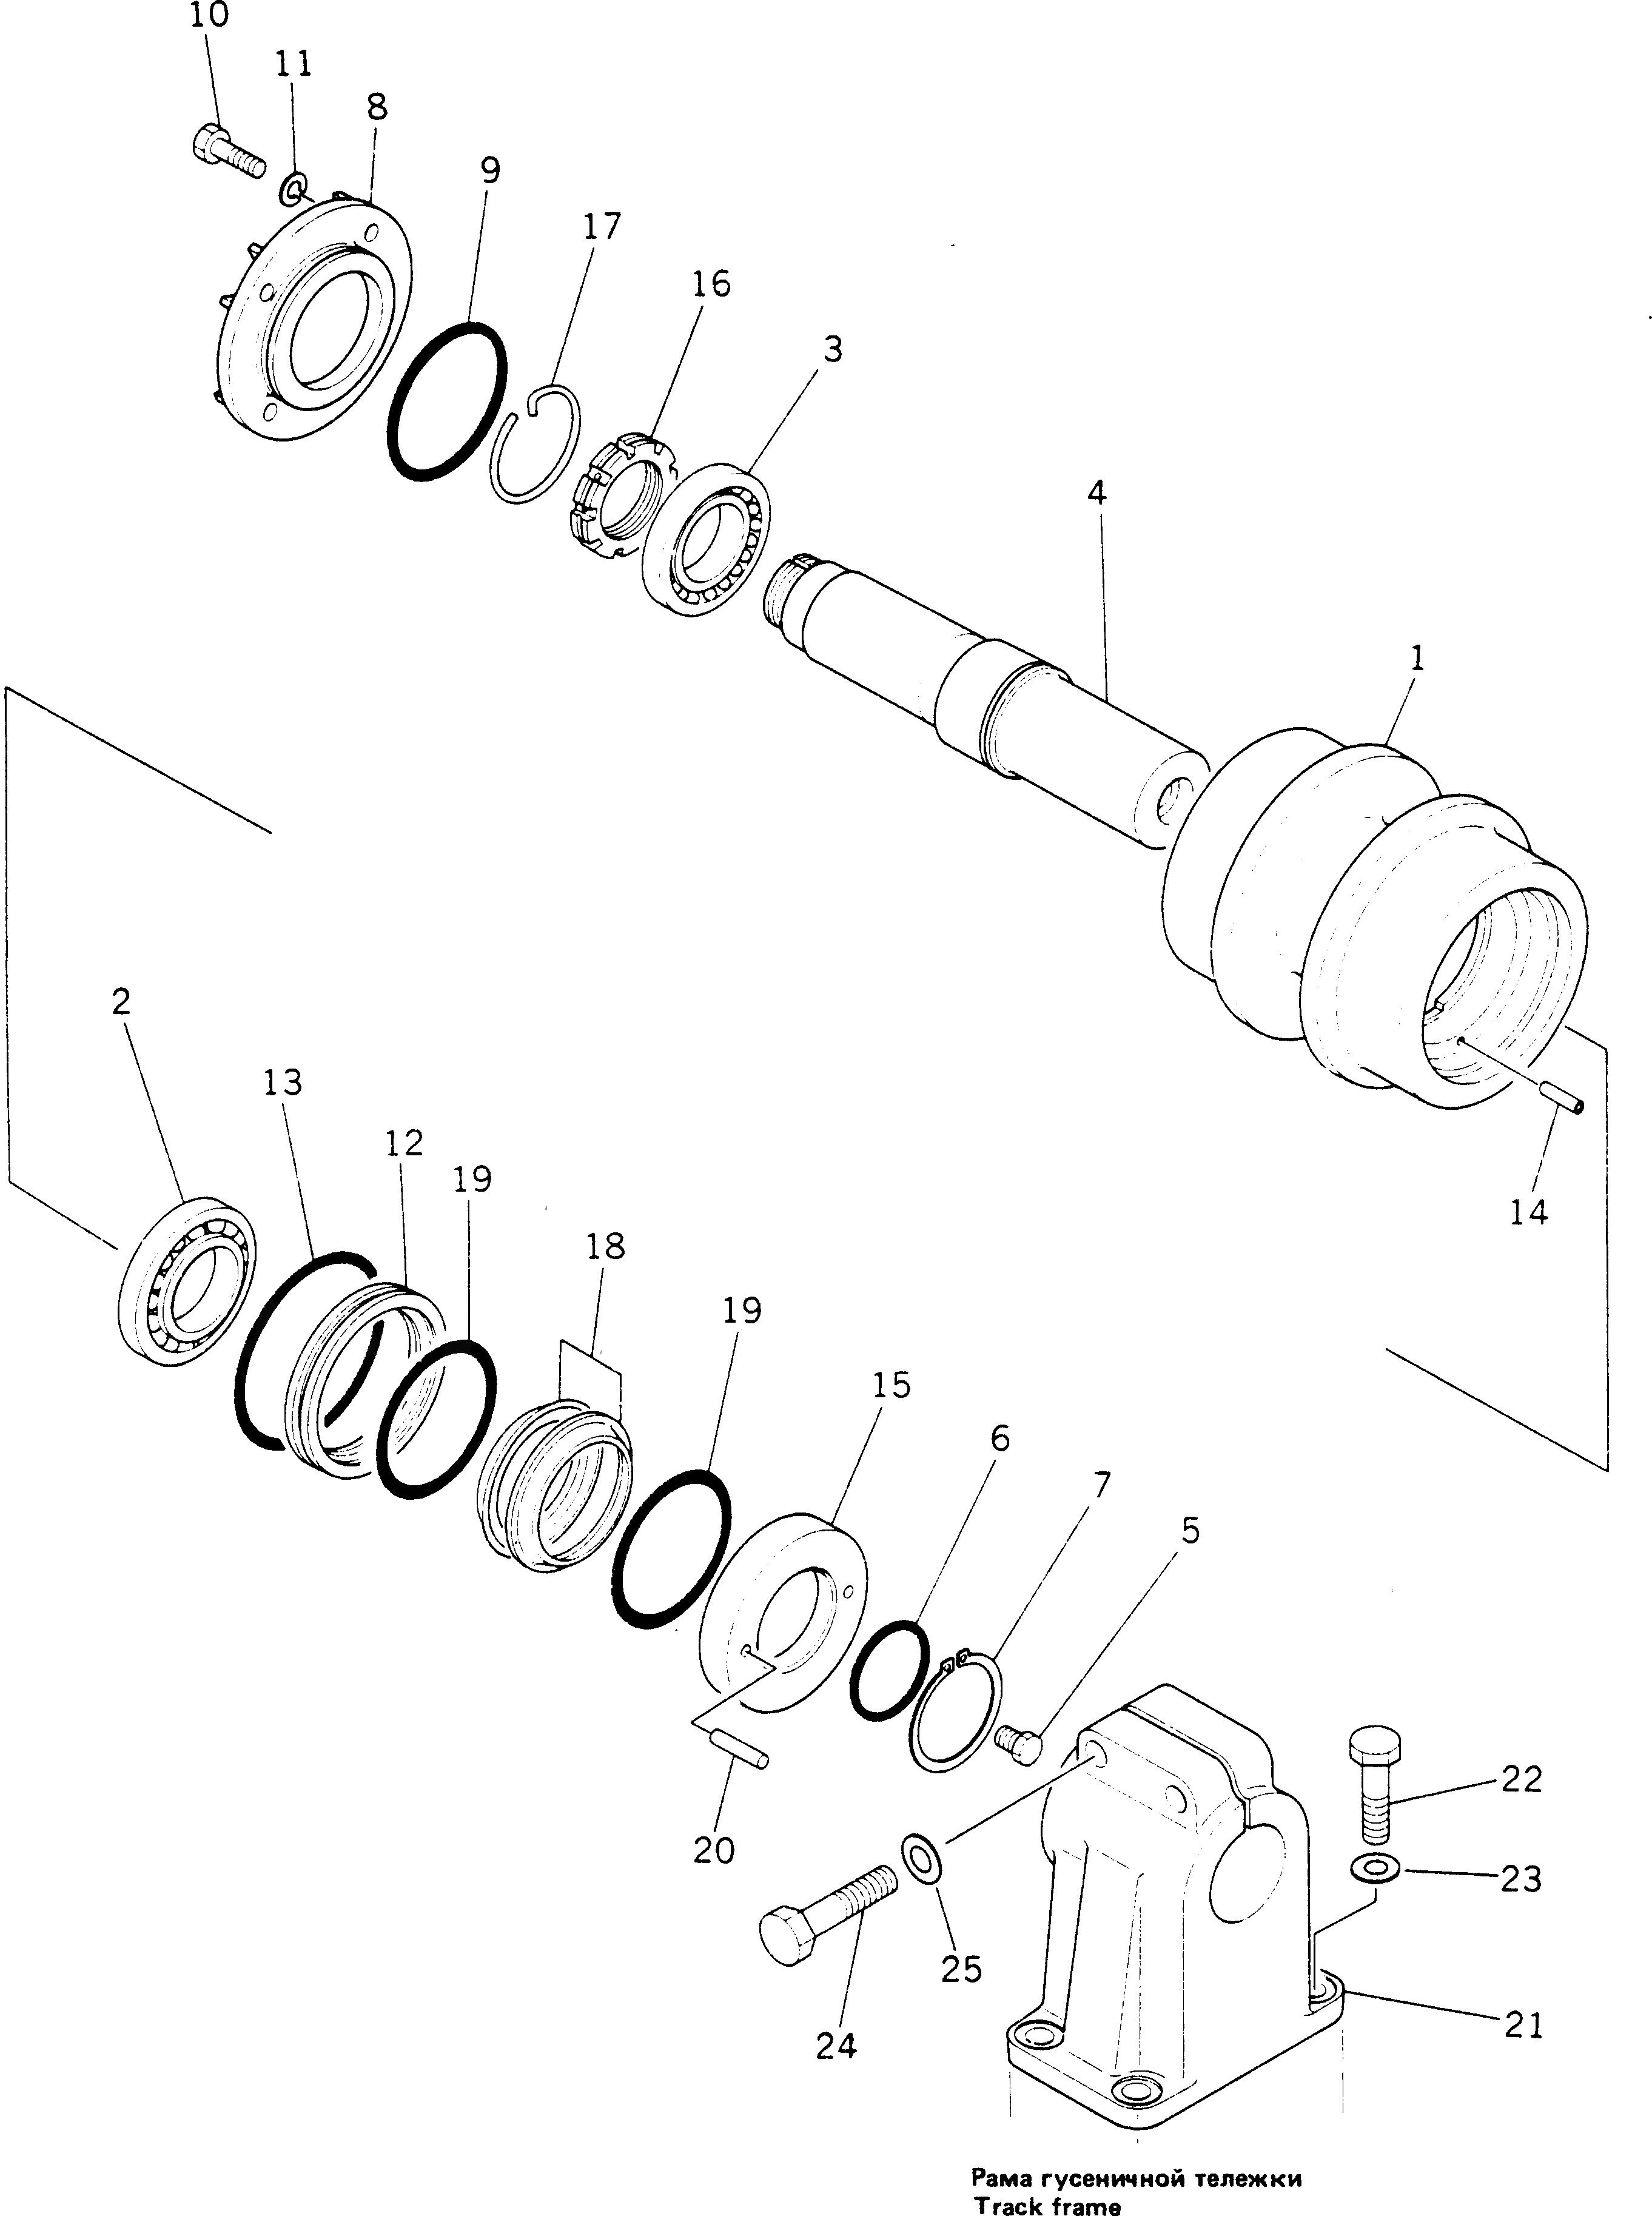 hight resolution of c36 wiring diagram wiring diagramc36 wiring diagram wiring diagram repair guidesc36 wiring diagram wiring diagram usedc36